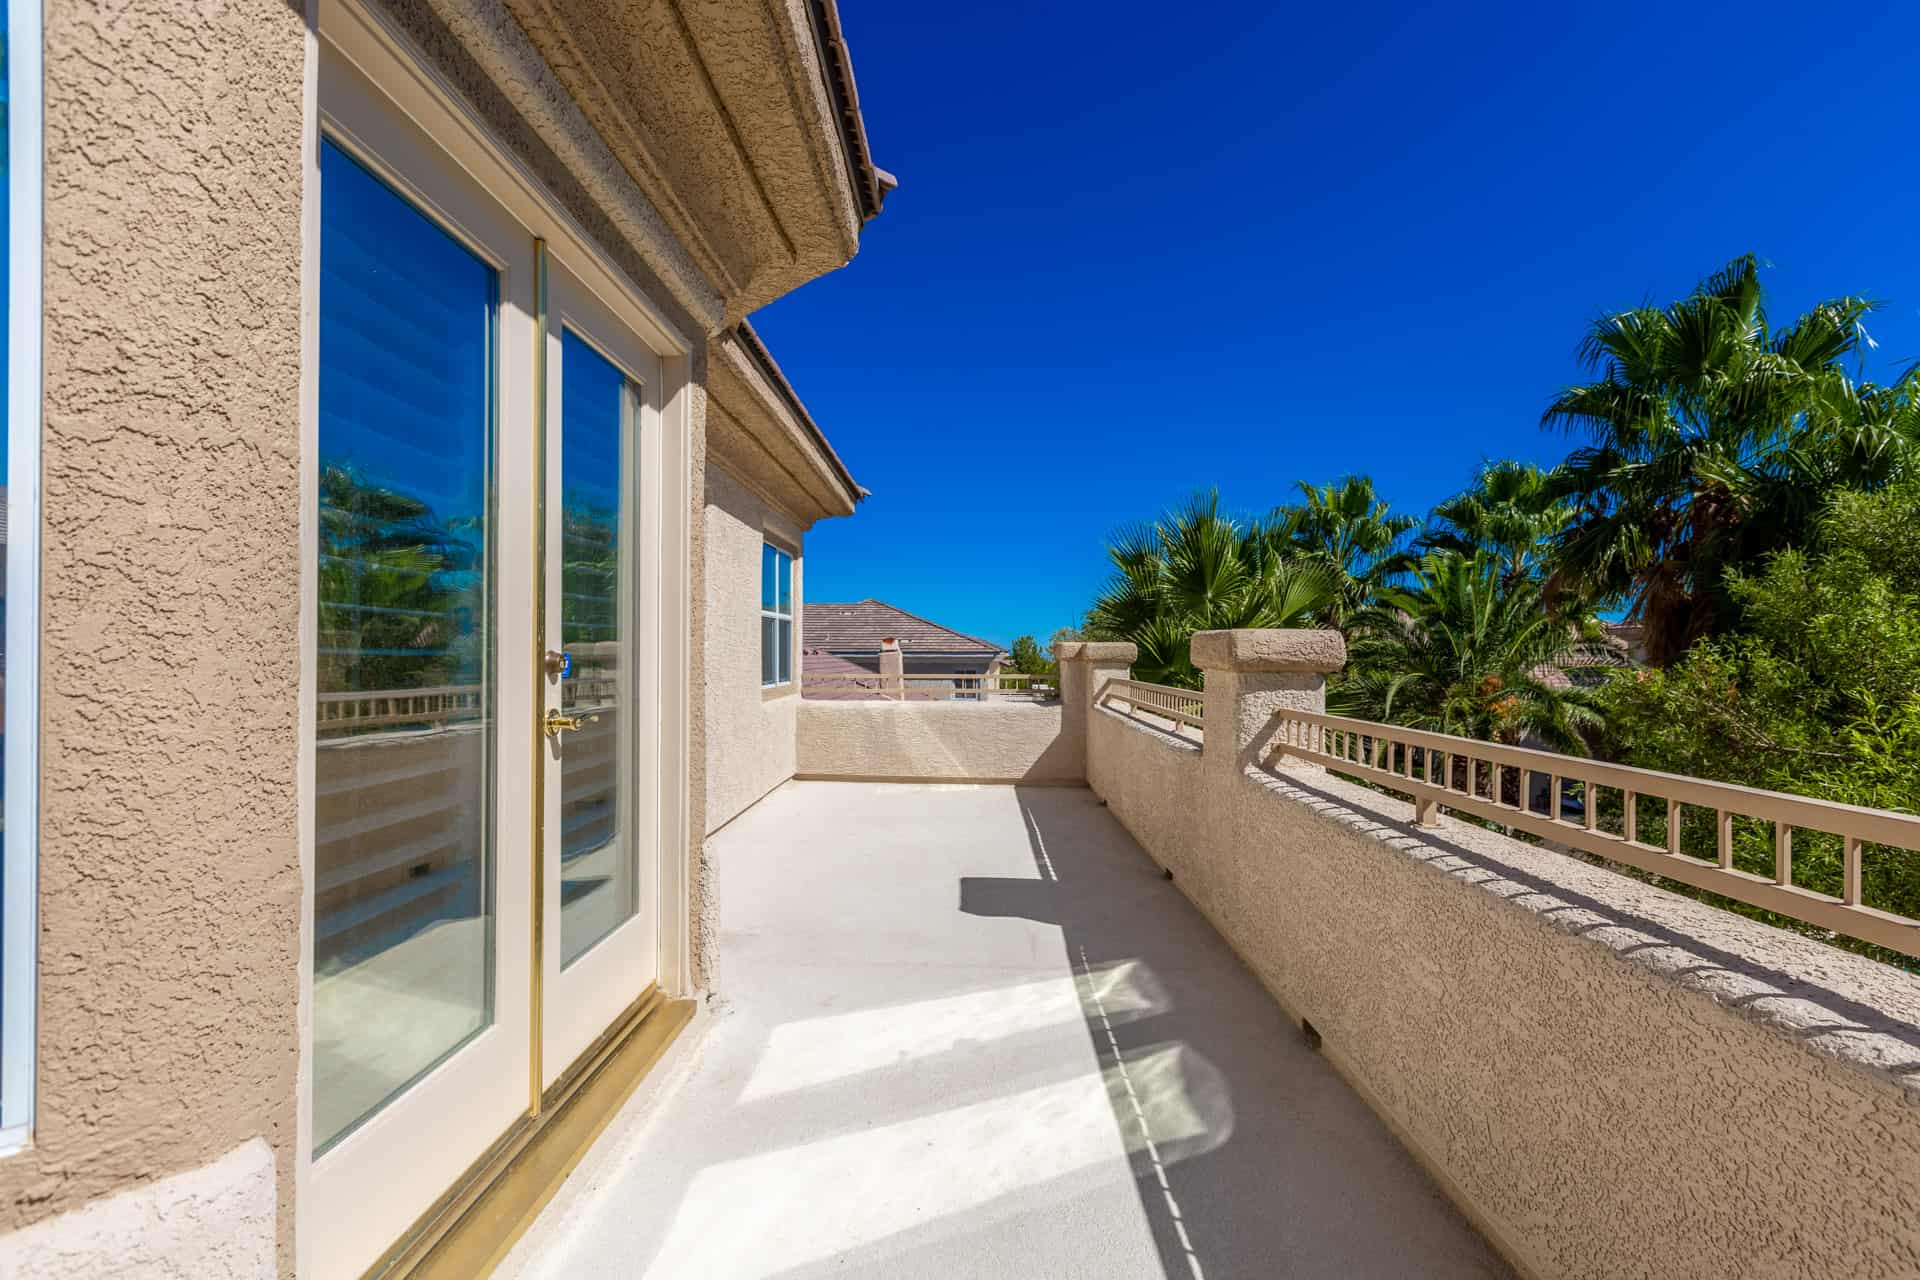 las-vegas-luxry-real-estate-realtor-rob-jensen-company-10729-grey-havens-court-willow-creek3857